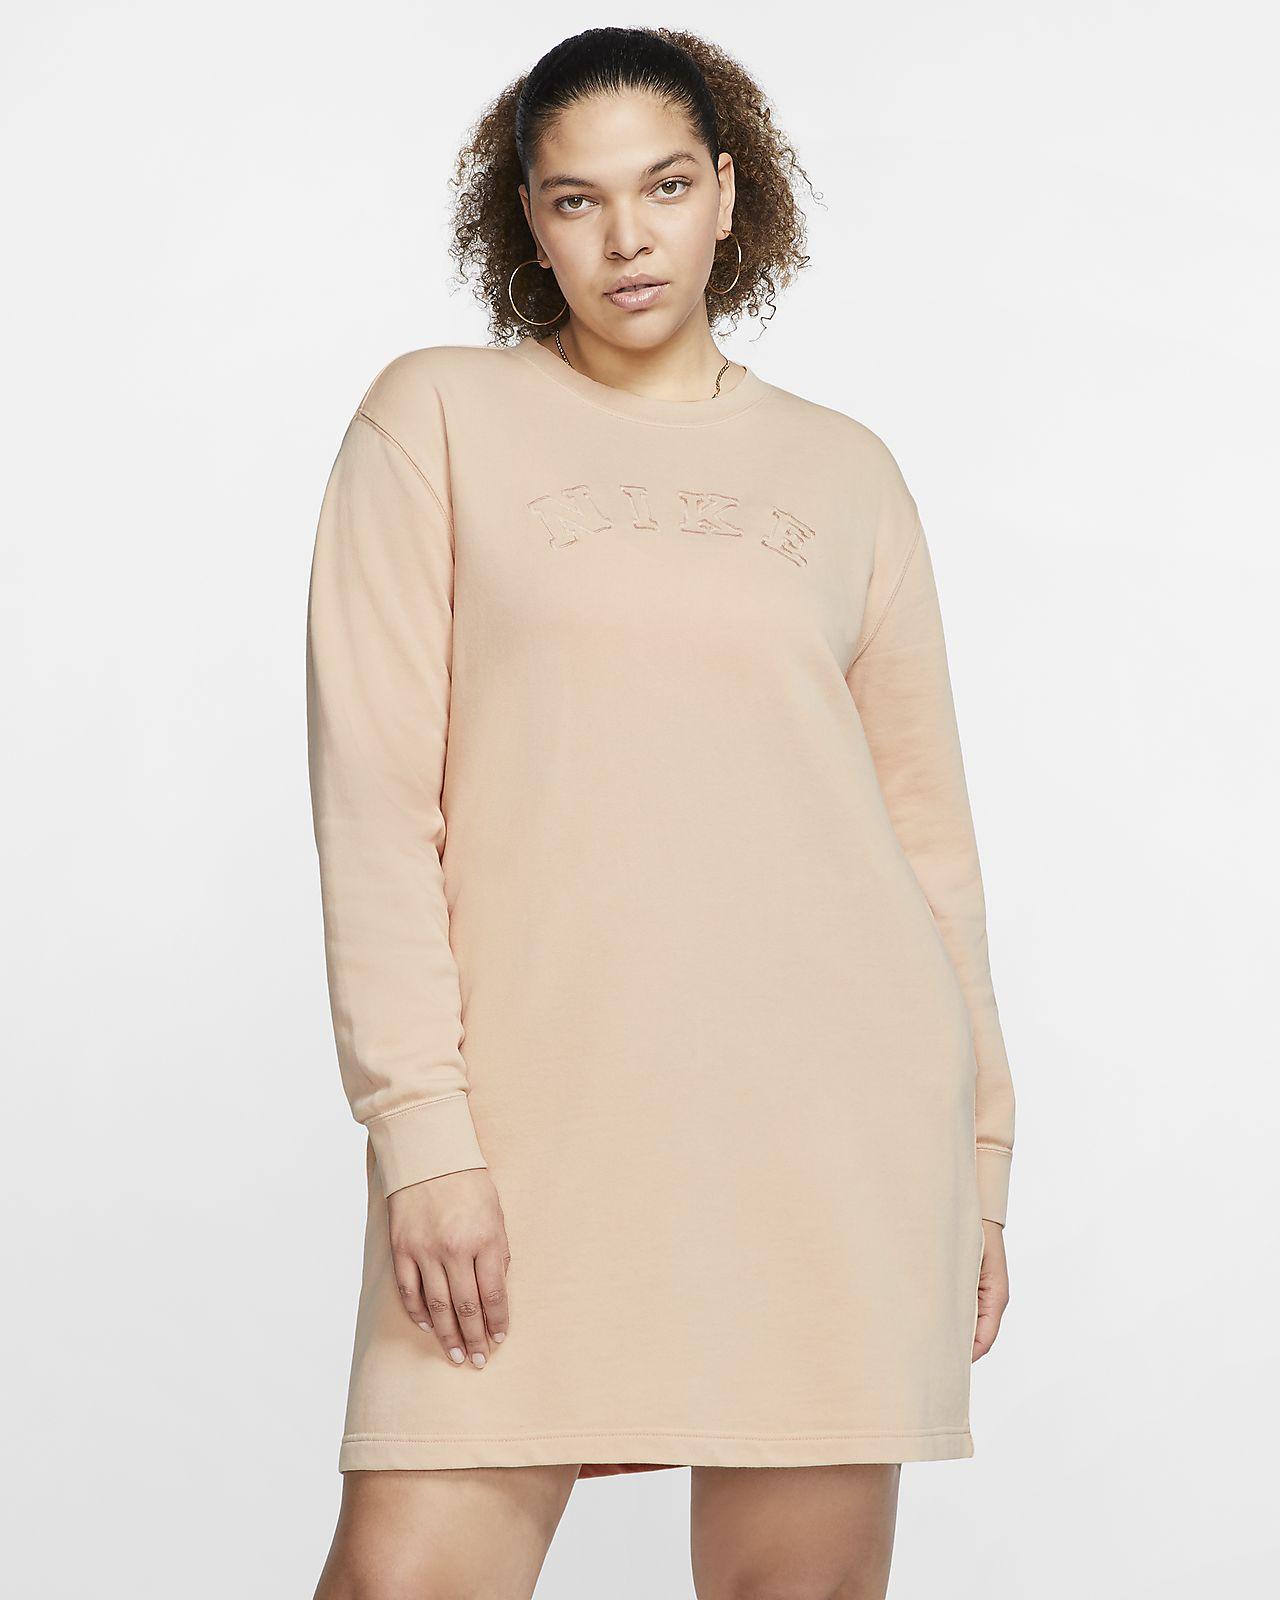 Vestido de French Terry para mujer (talla grande) Nike Sportswear